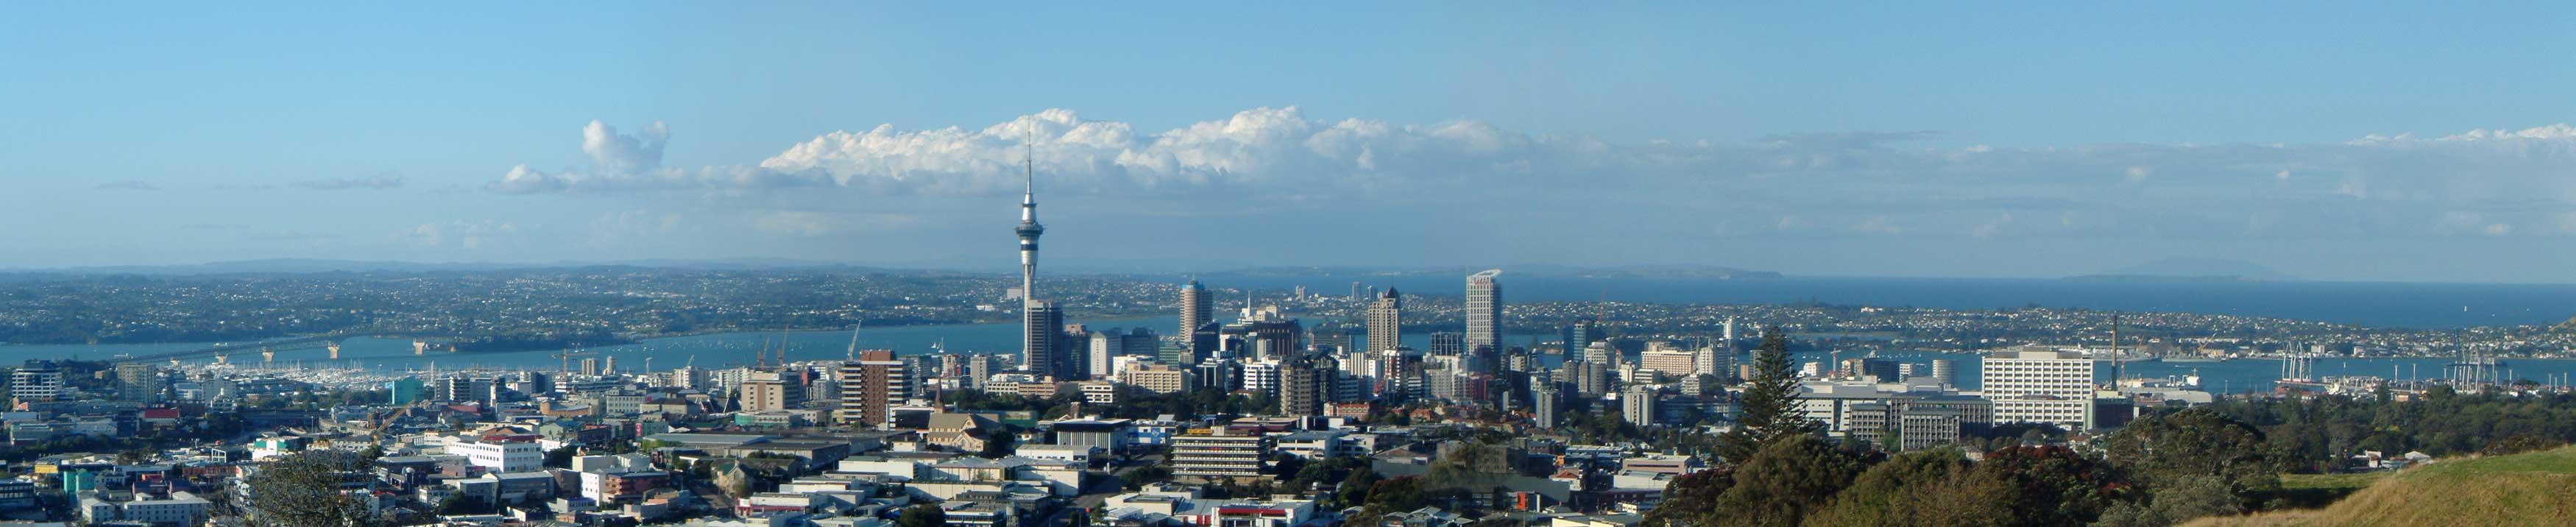 Auckland-city-panorama-bjdd